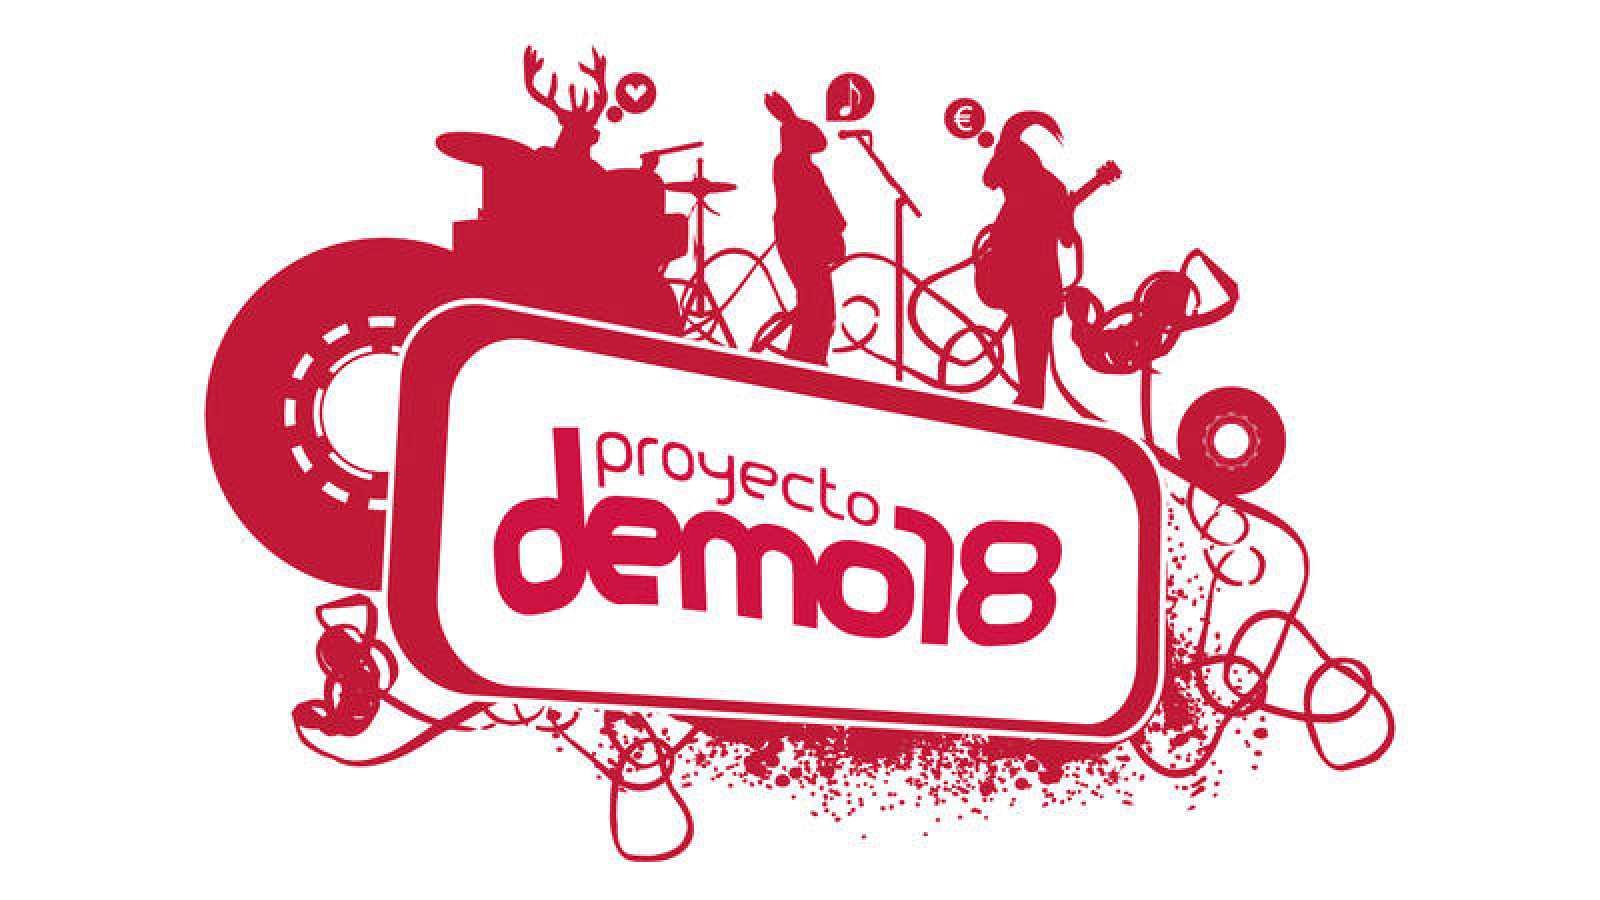 proyecto demo 2018